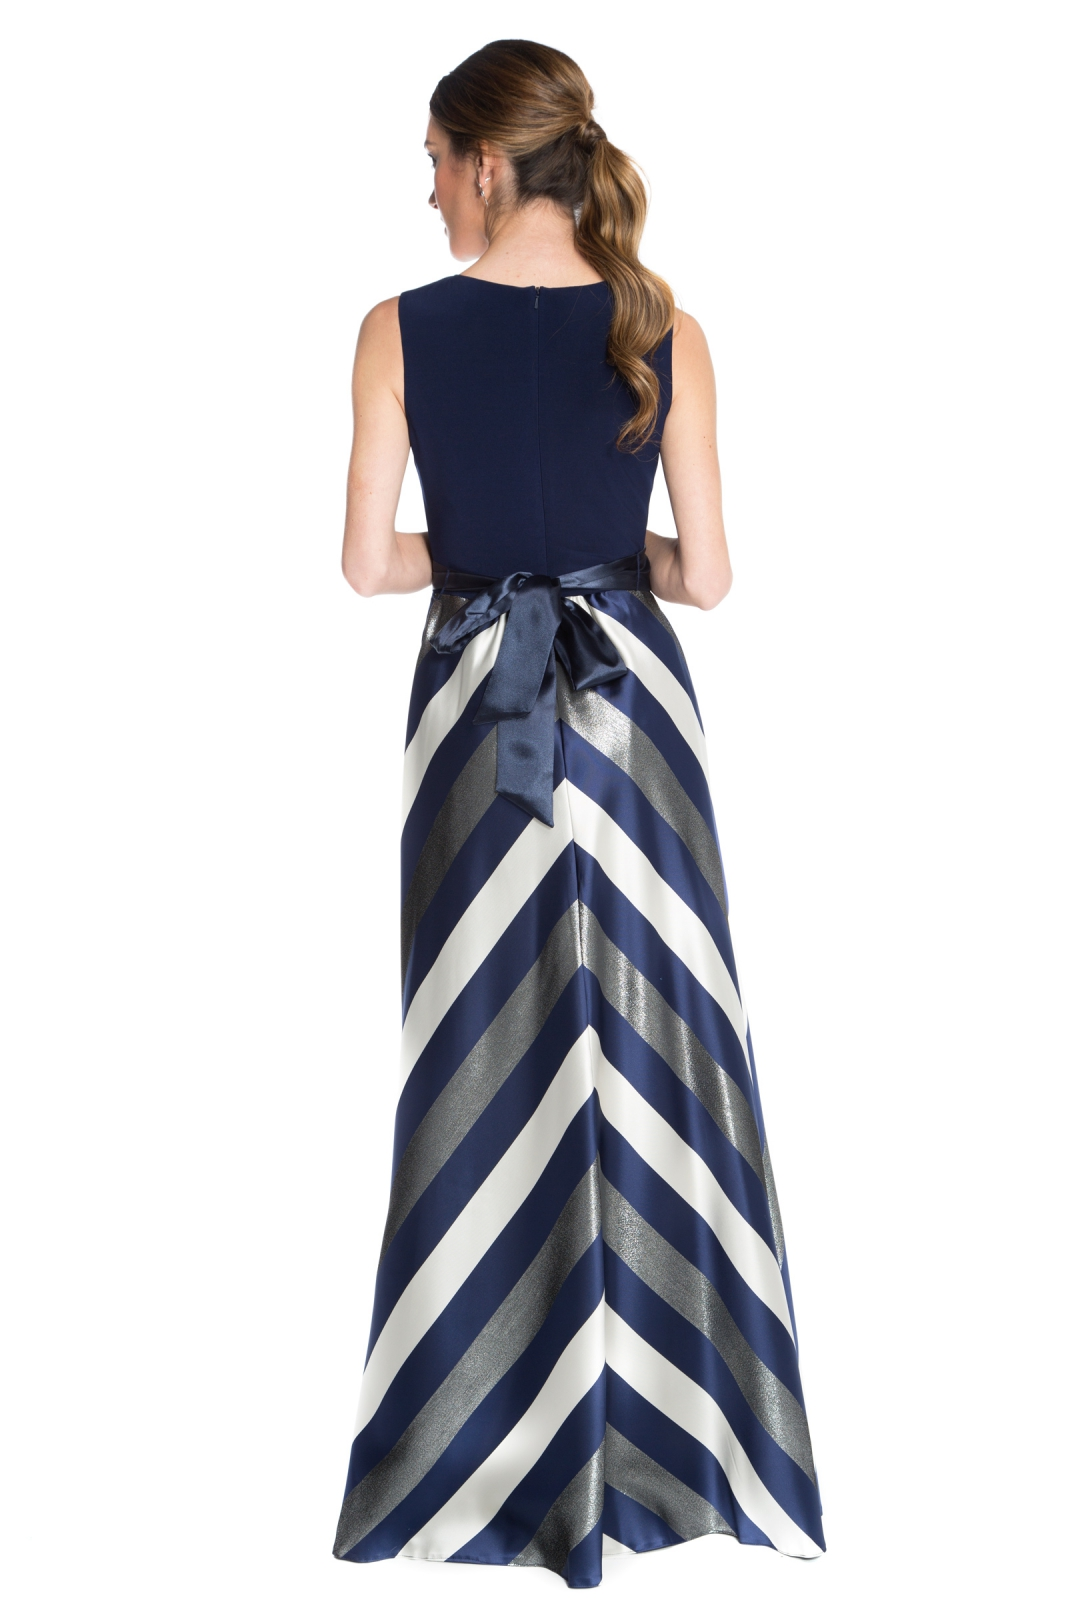 left - Vestido Navy Stripes